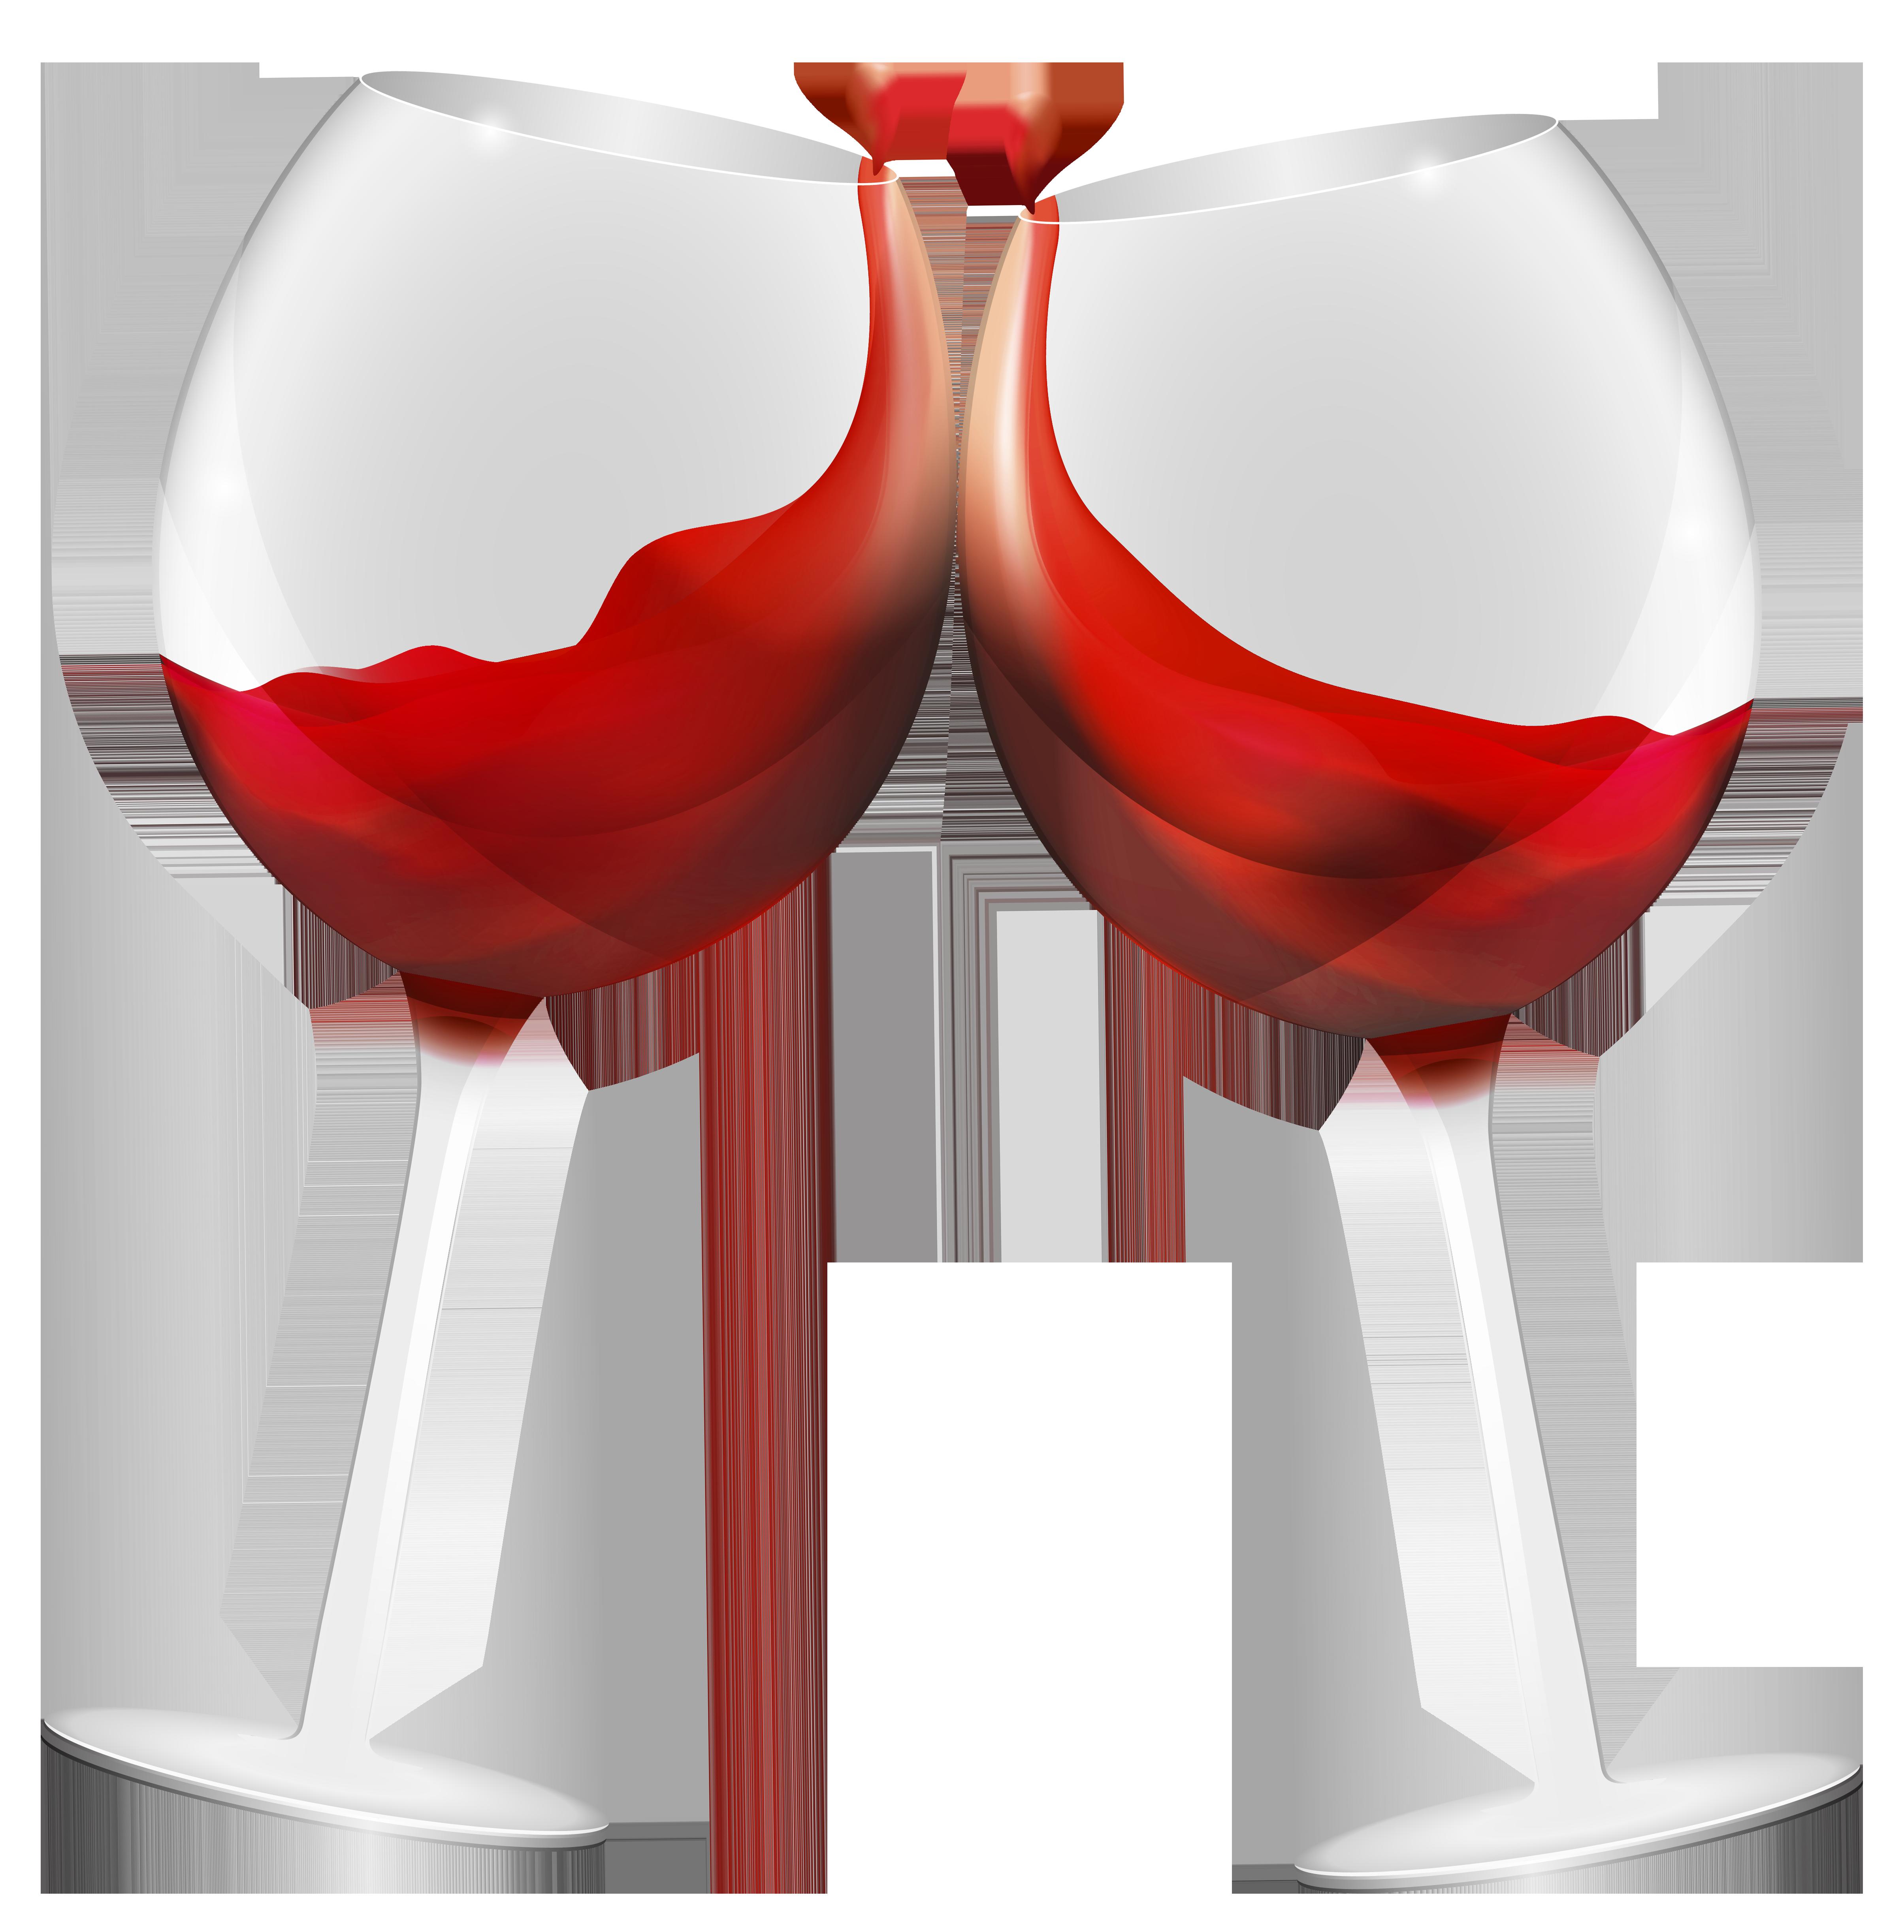 4819x4891 Wassail Wine Glassesu200b Gallery Yopriceville